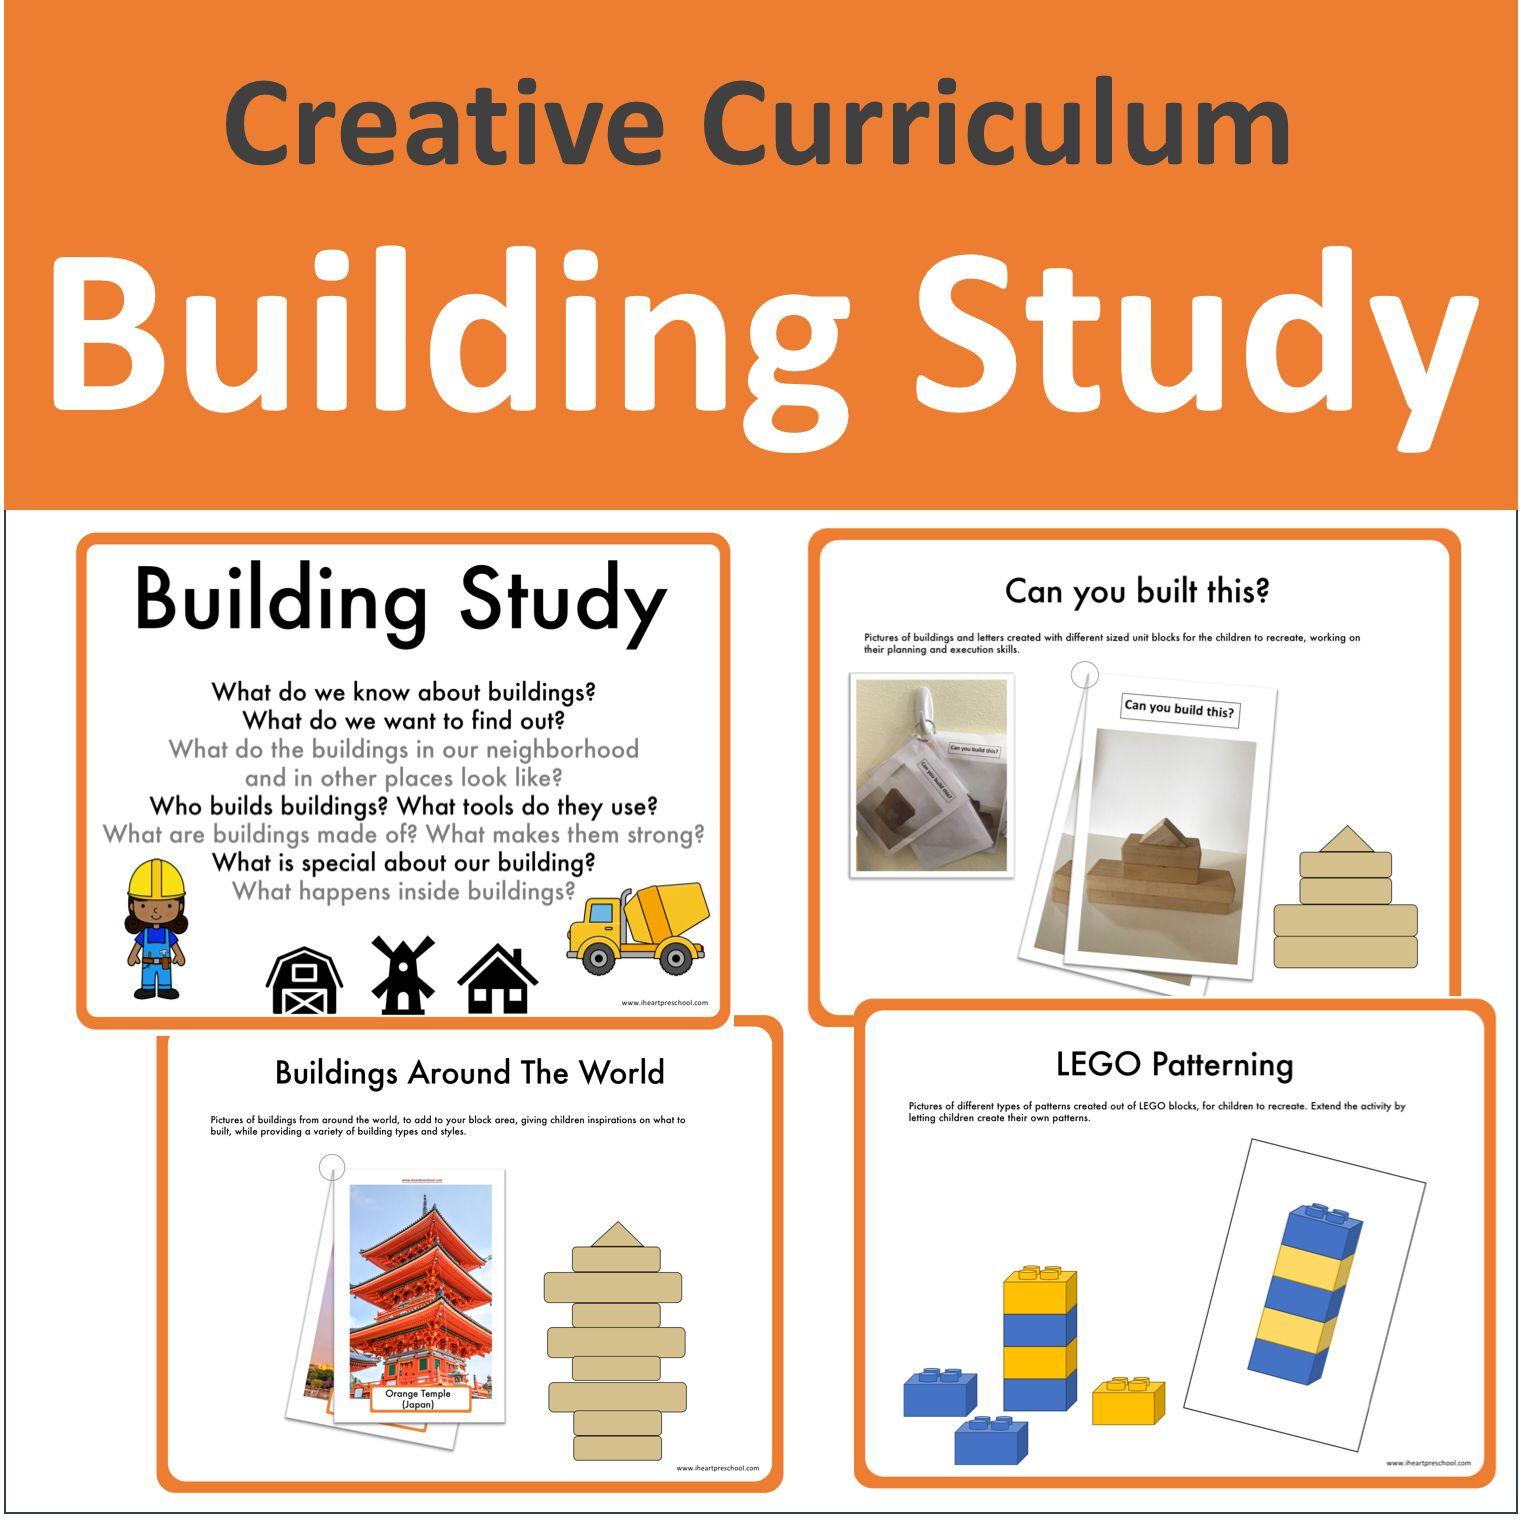 Creative Curriculum Building Study Teaching Strategies Creative Curriculum Creative Curriculum Creative Curriculum Building Study